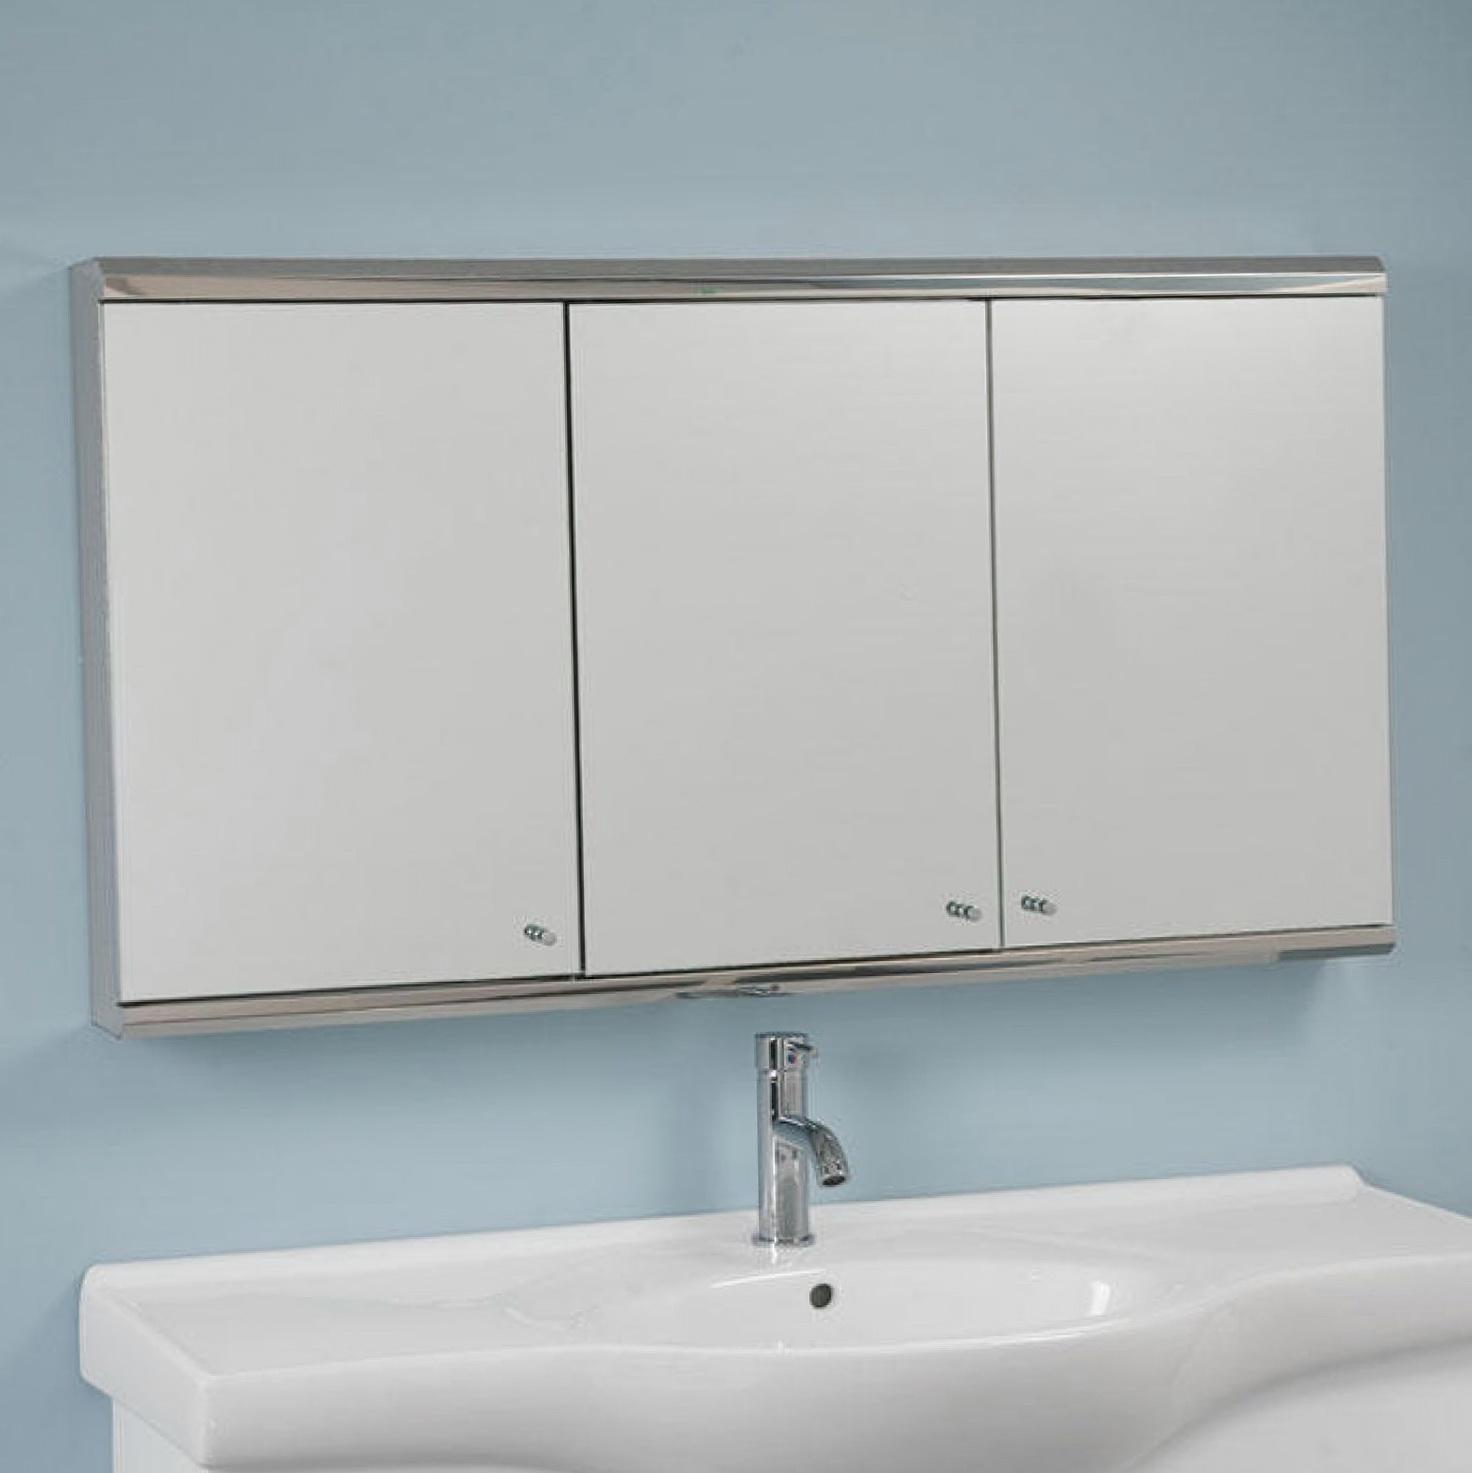 Hickory Medicine Cabinet With Mirror